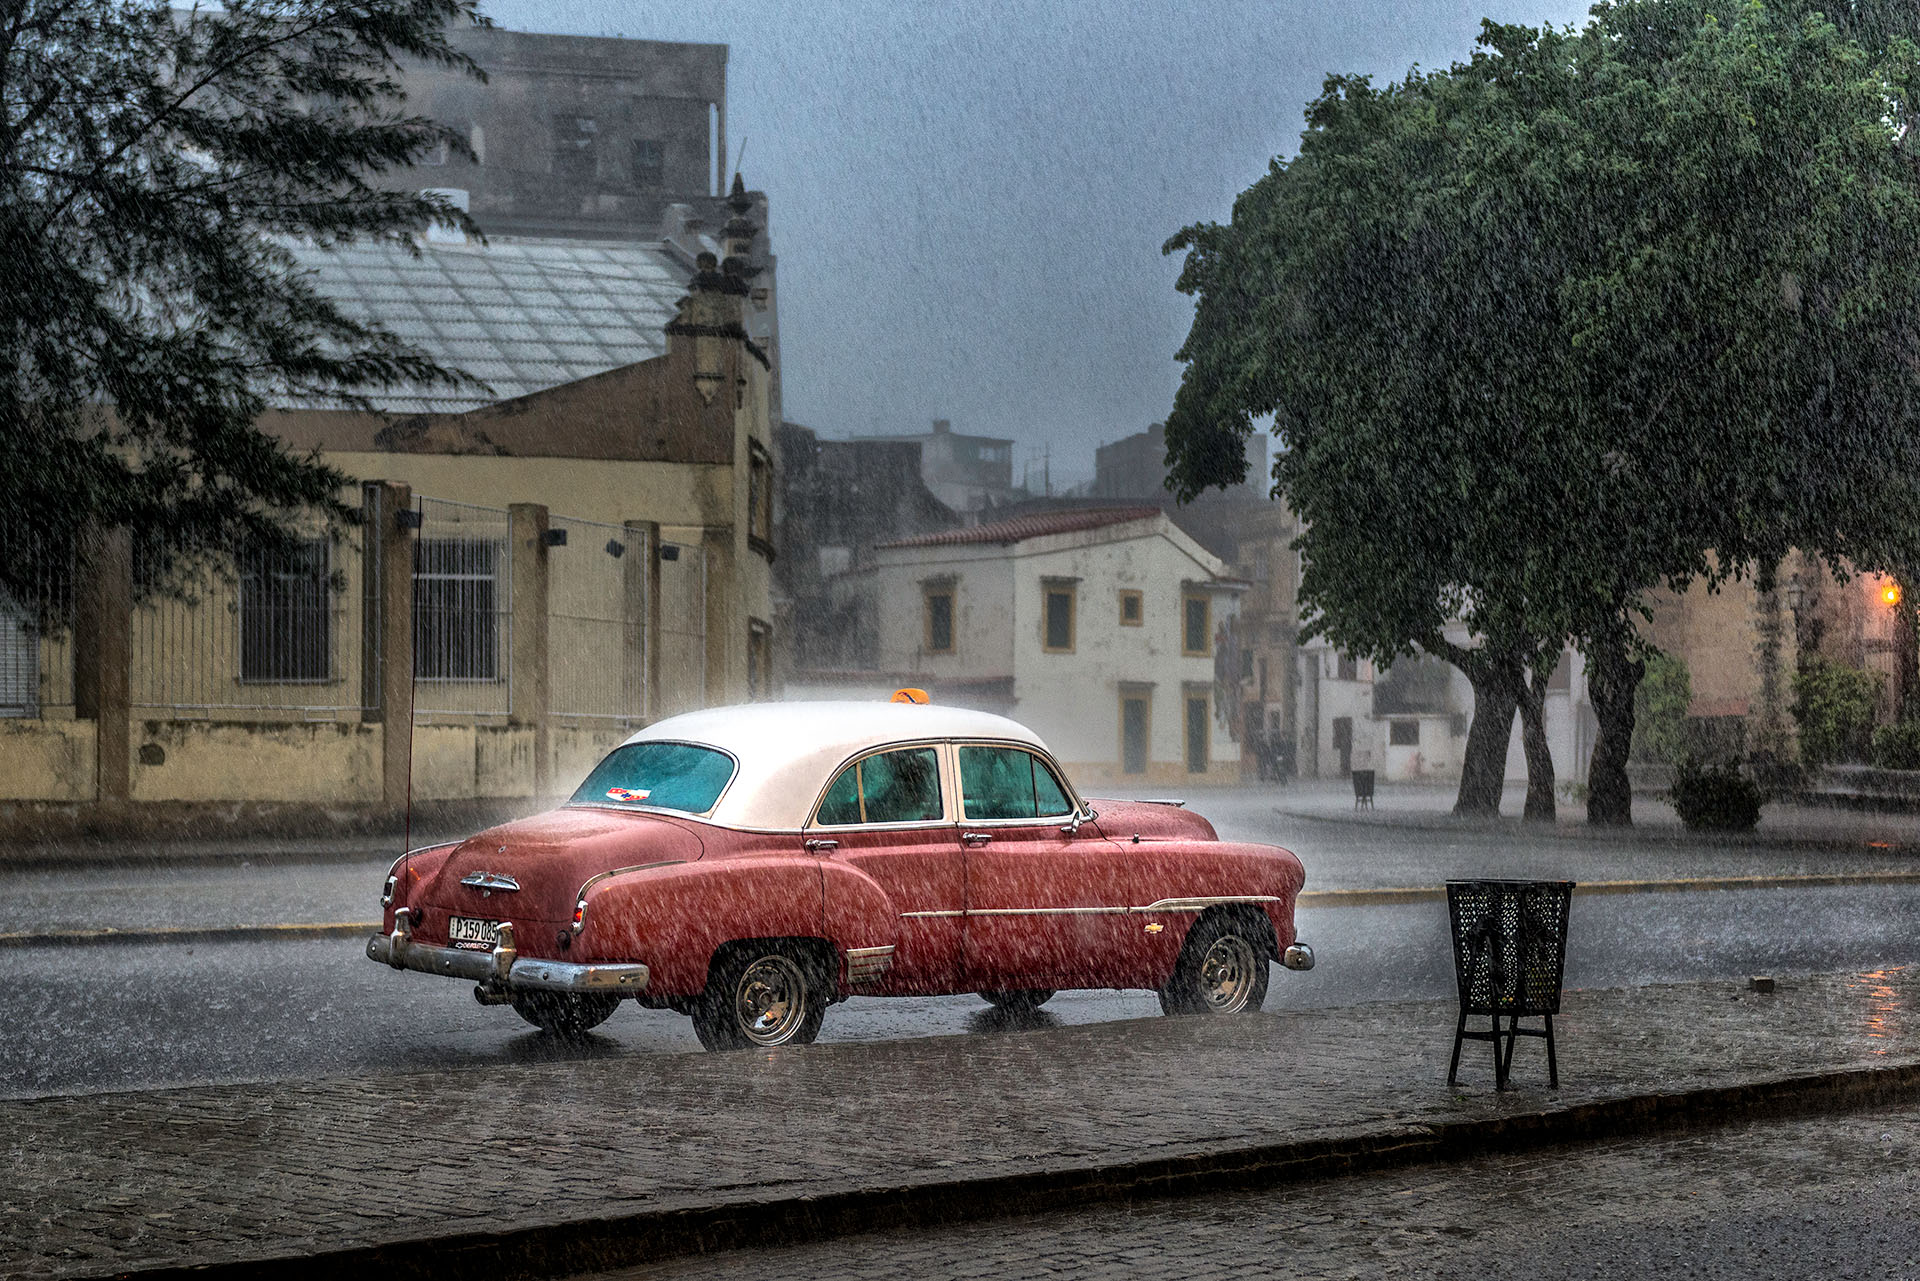 Lluvia al Atardecer